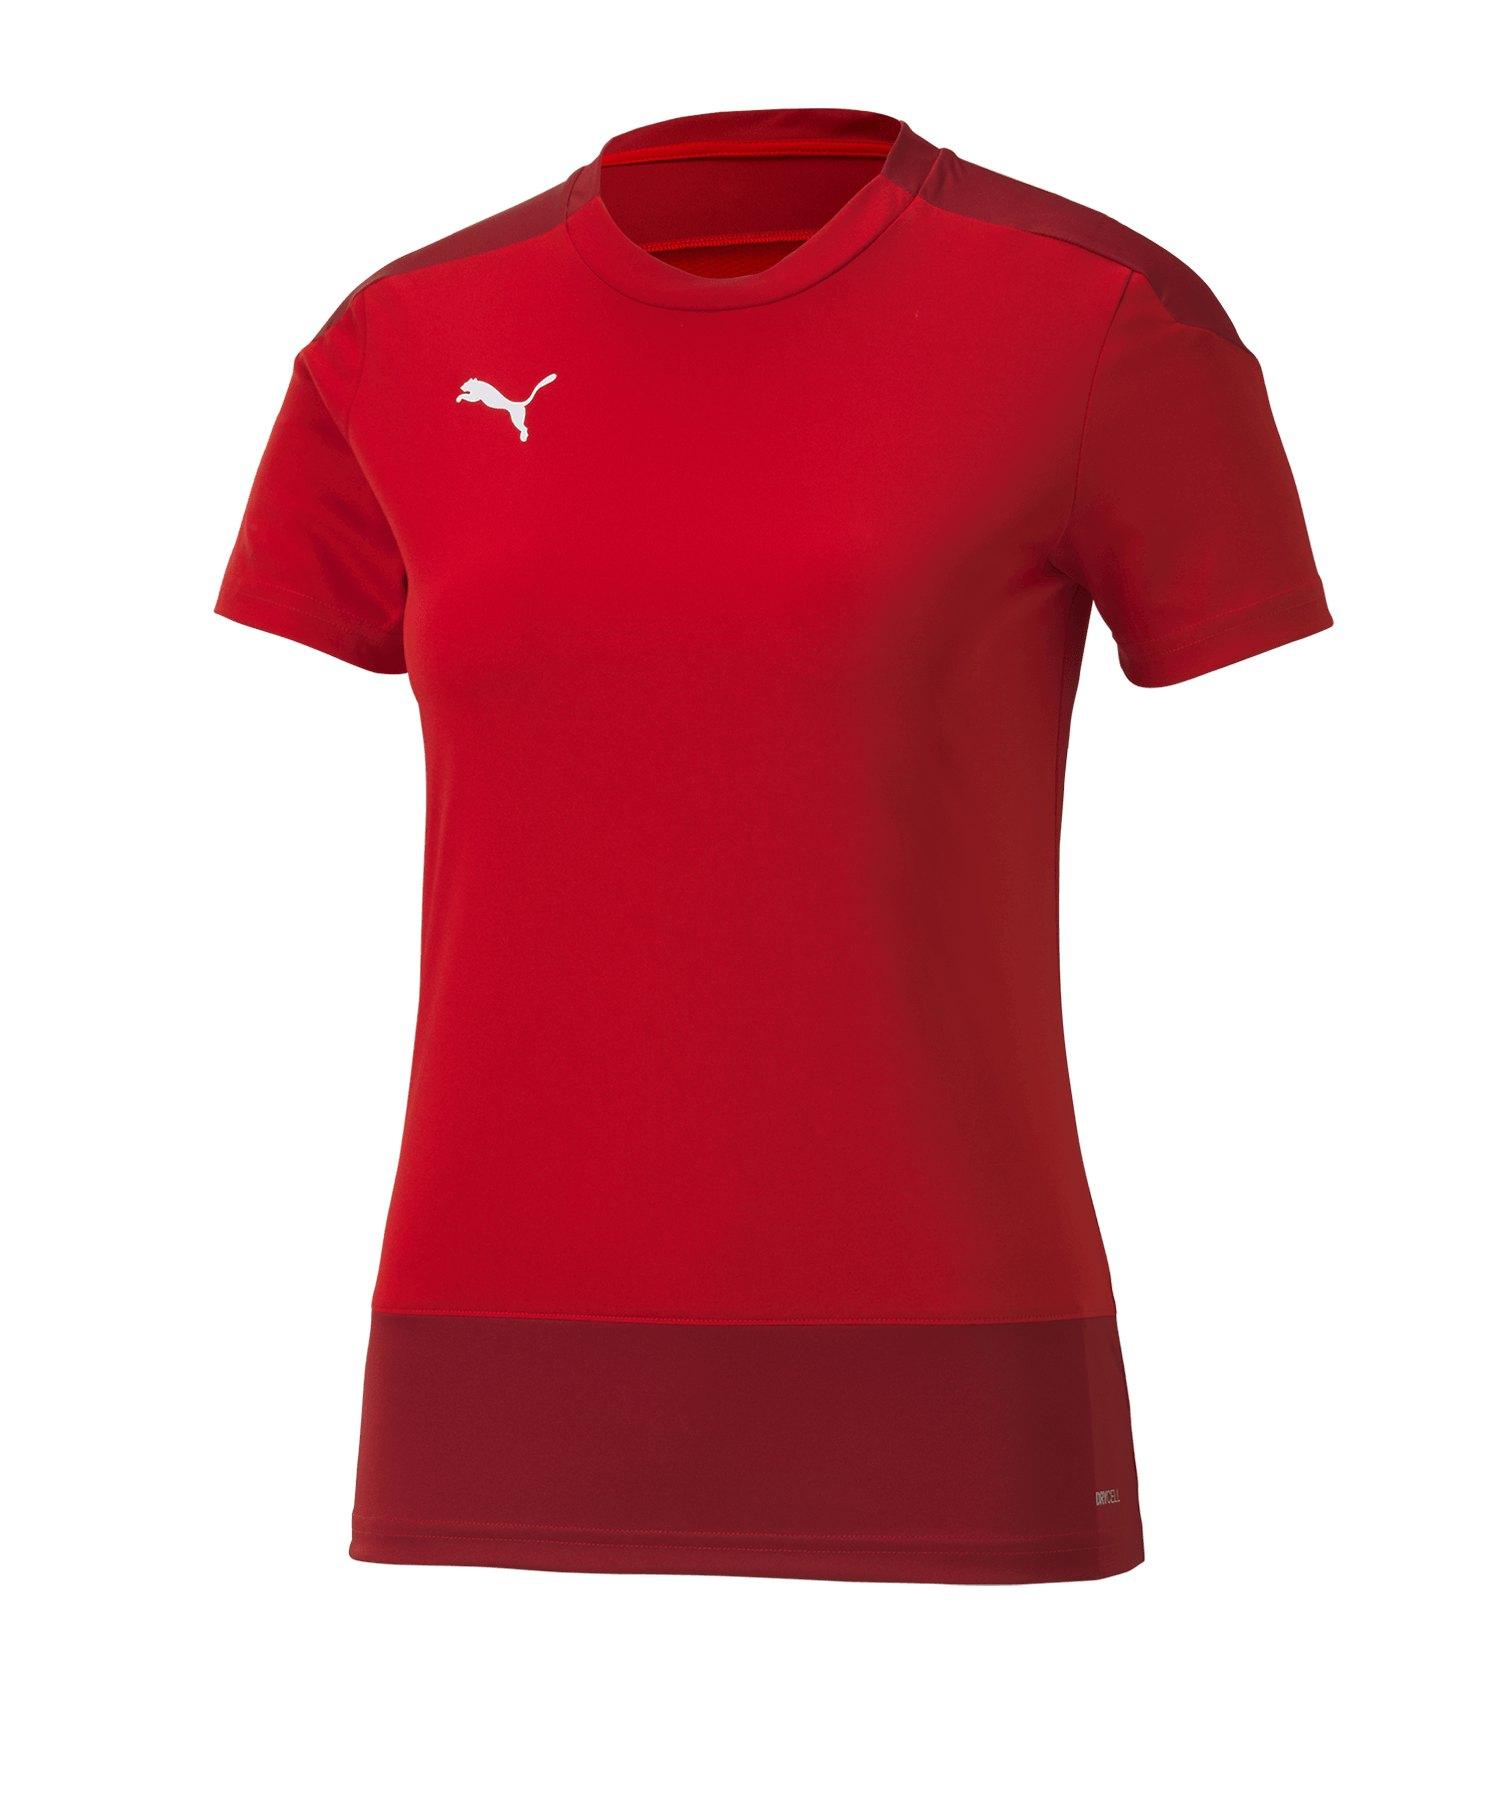 PUMA teamGOAL 23 Training Trikot Damen Rot F01 - rot